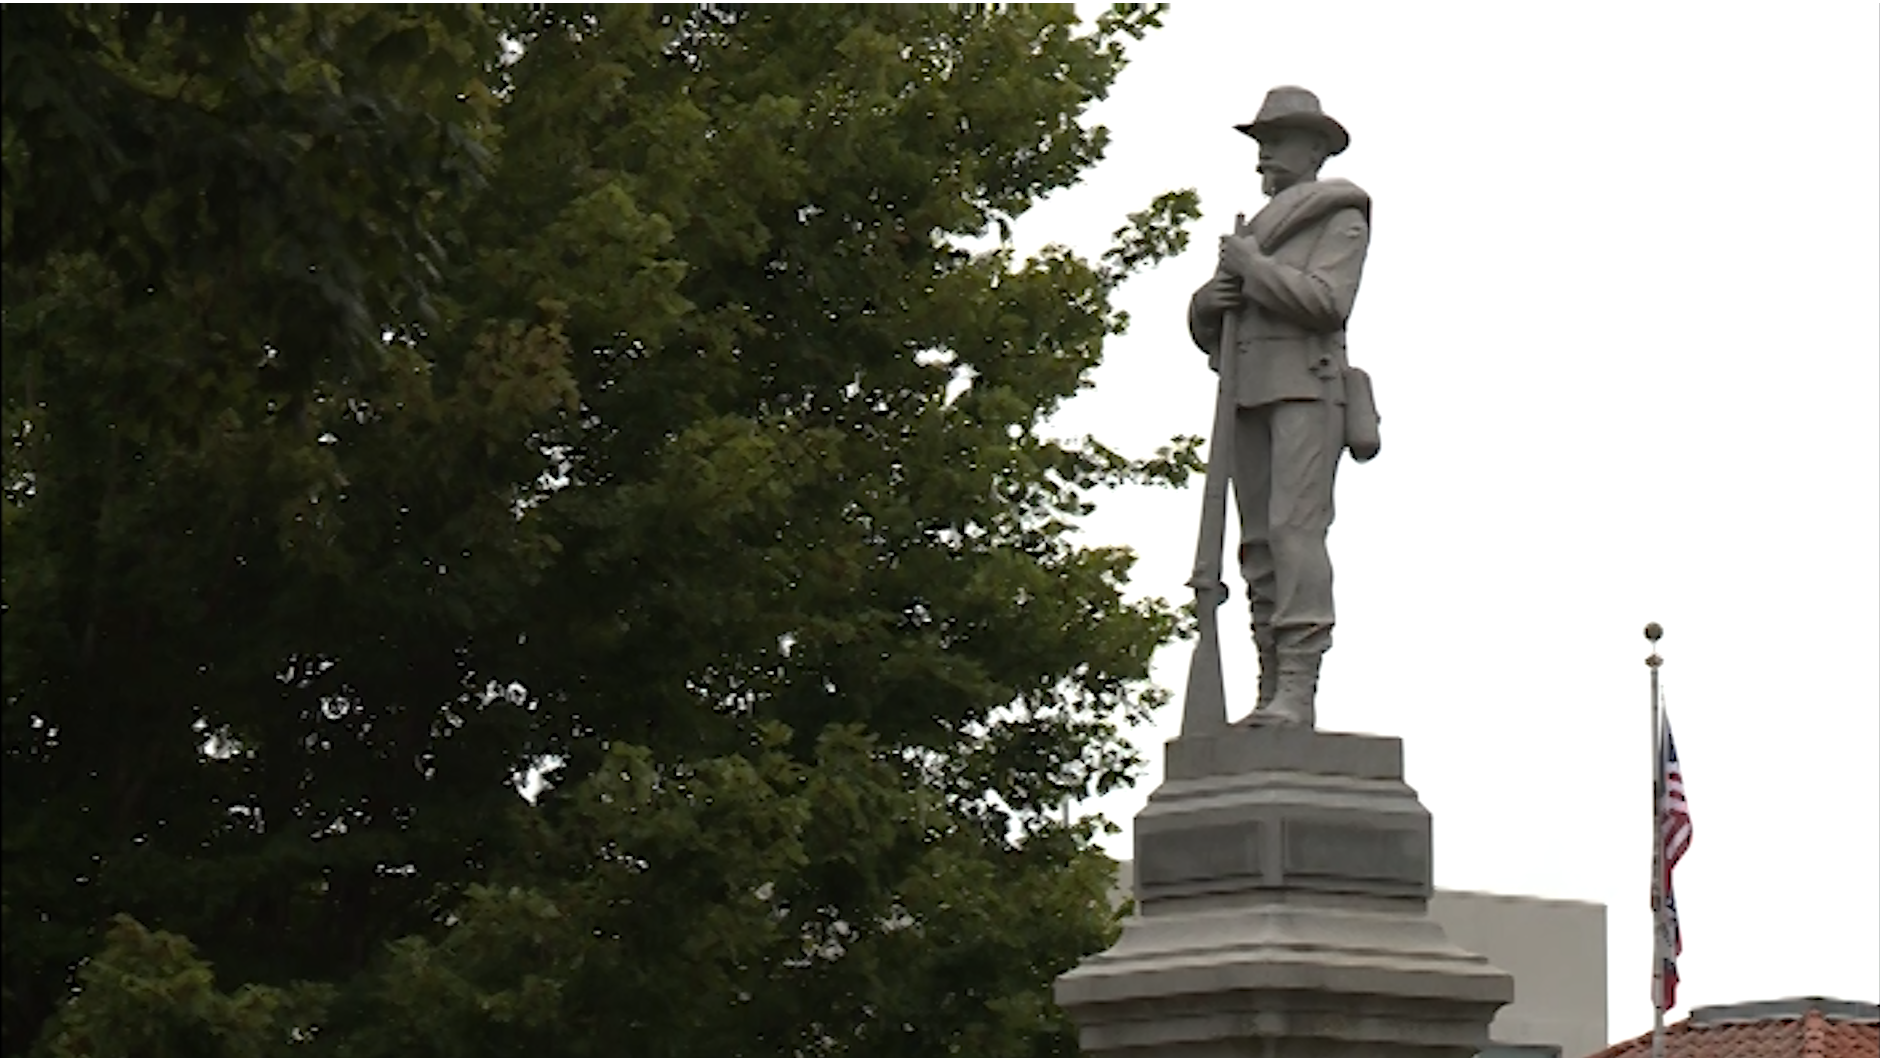 Bentonville's Confederate Statue